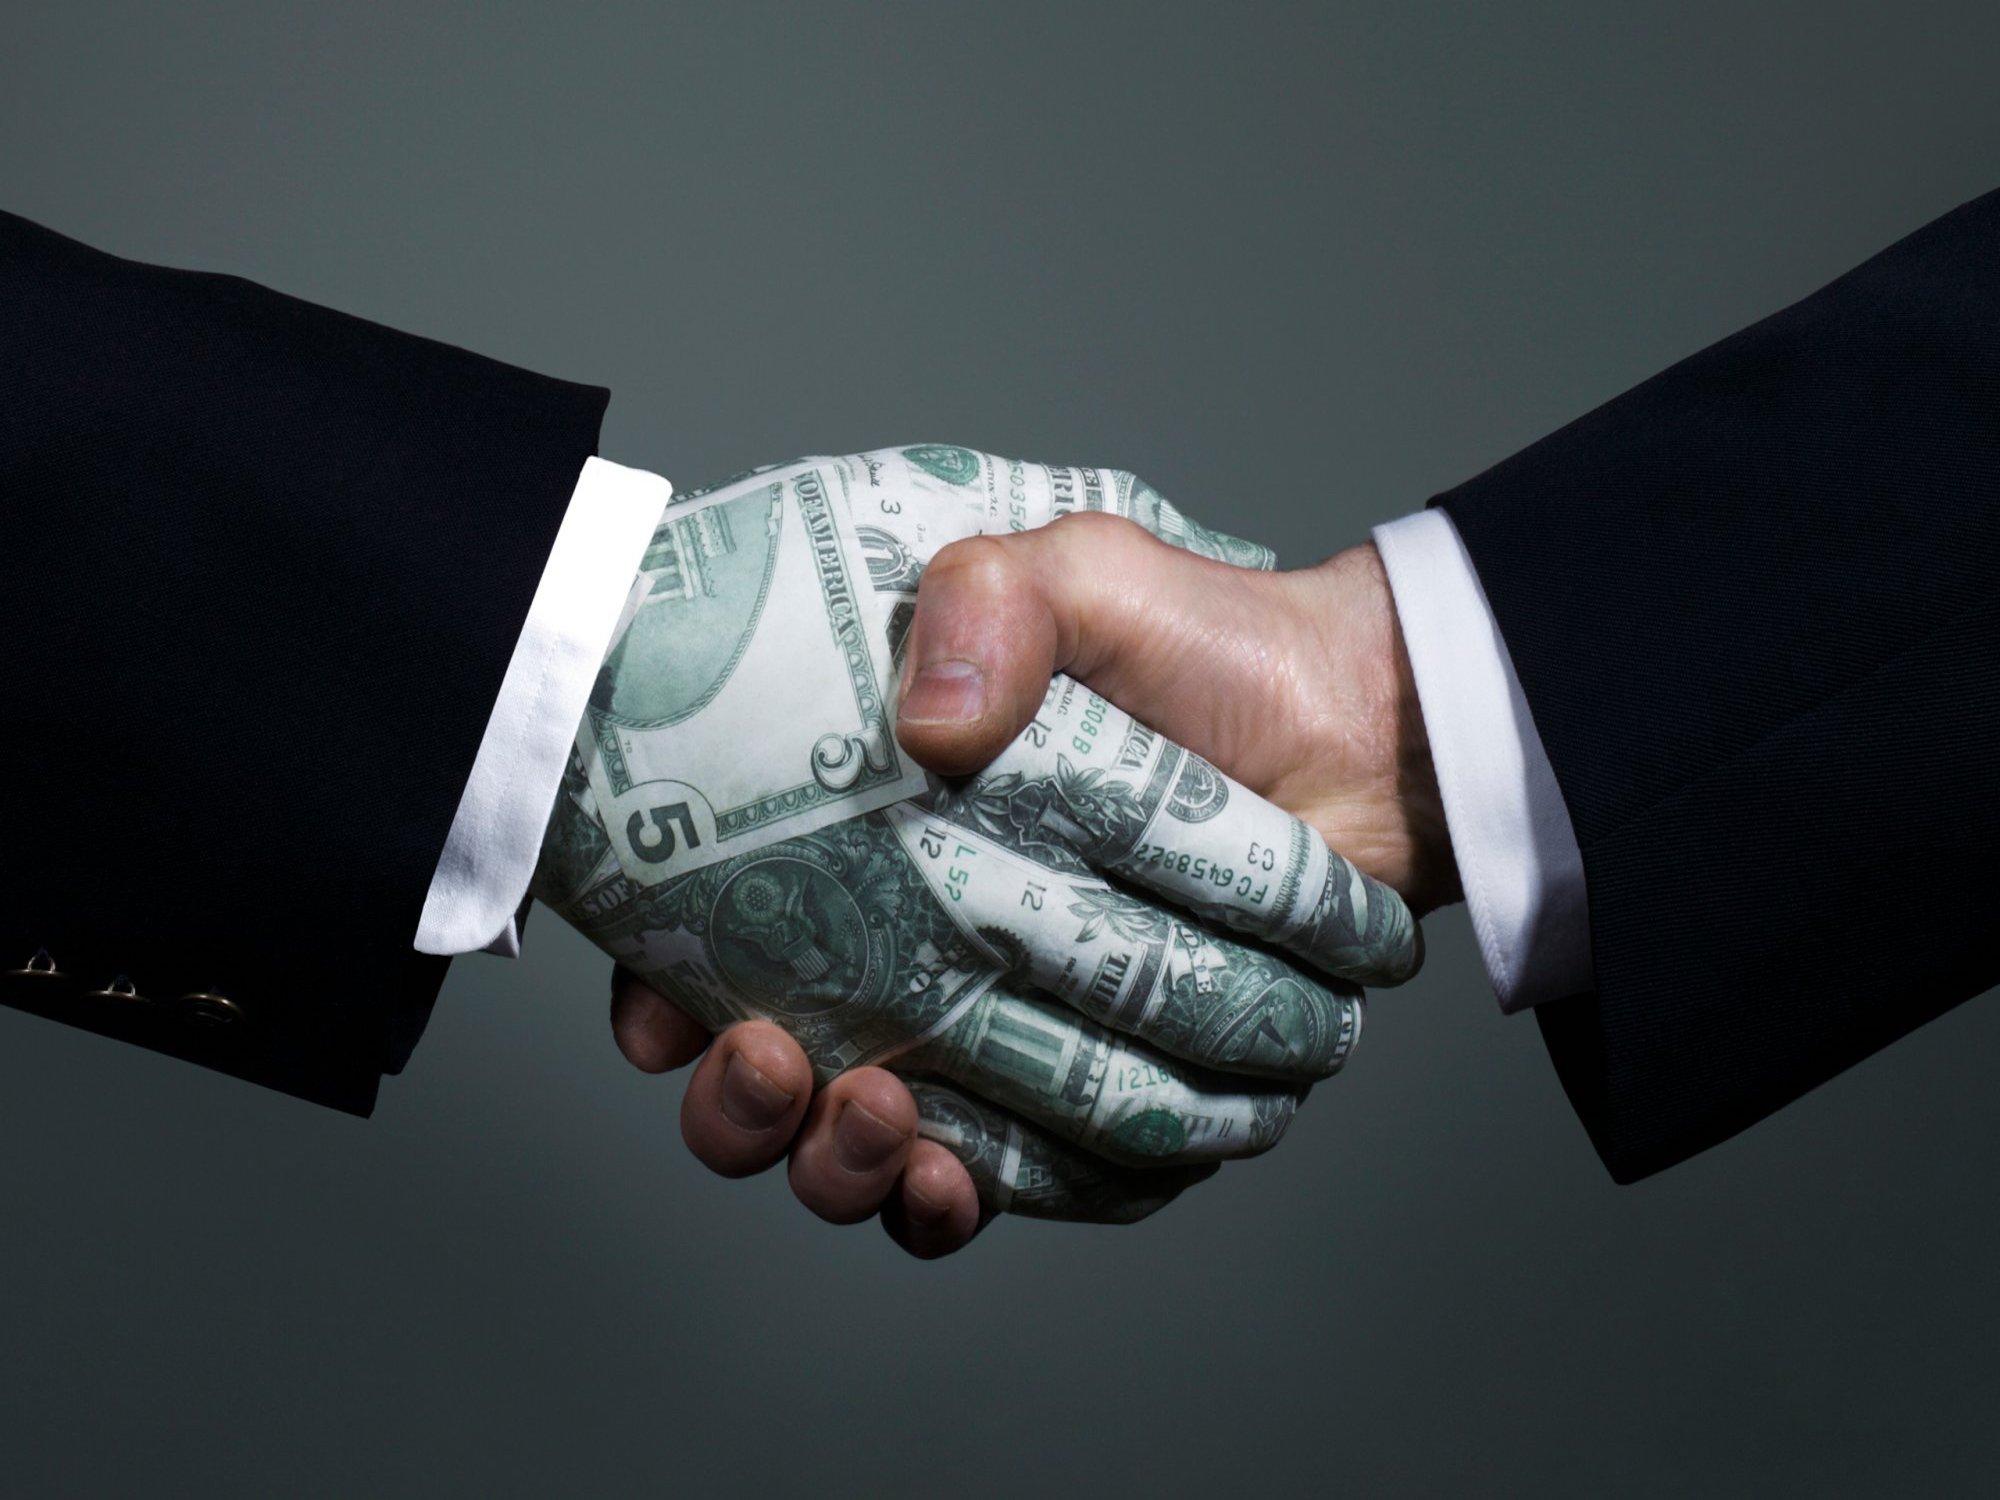 venture-partners-role-in-venture-capital-firms.jpeg